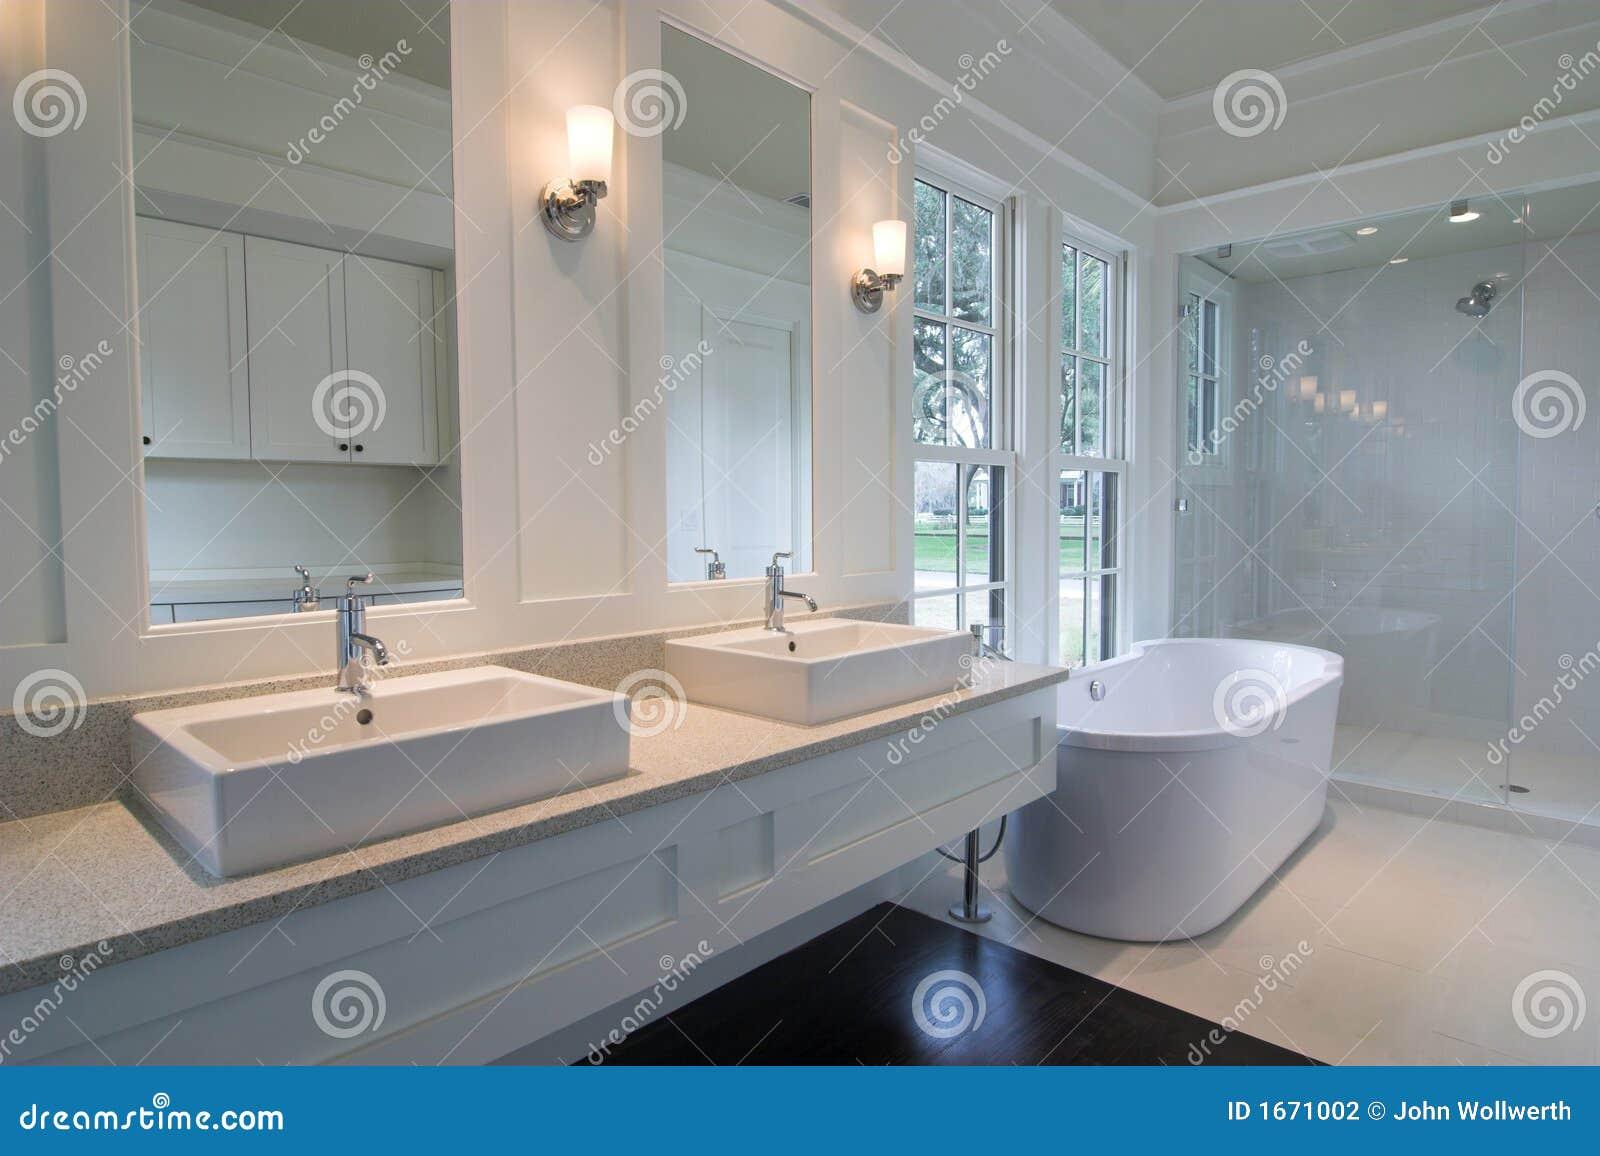 Salle de bains blanche ch re - Salle de bain toute blanche ...